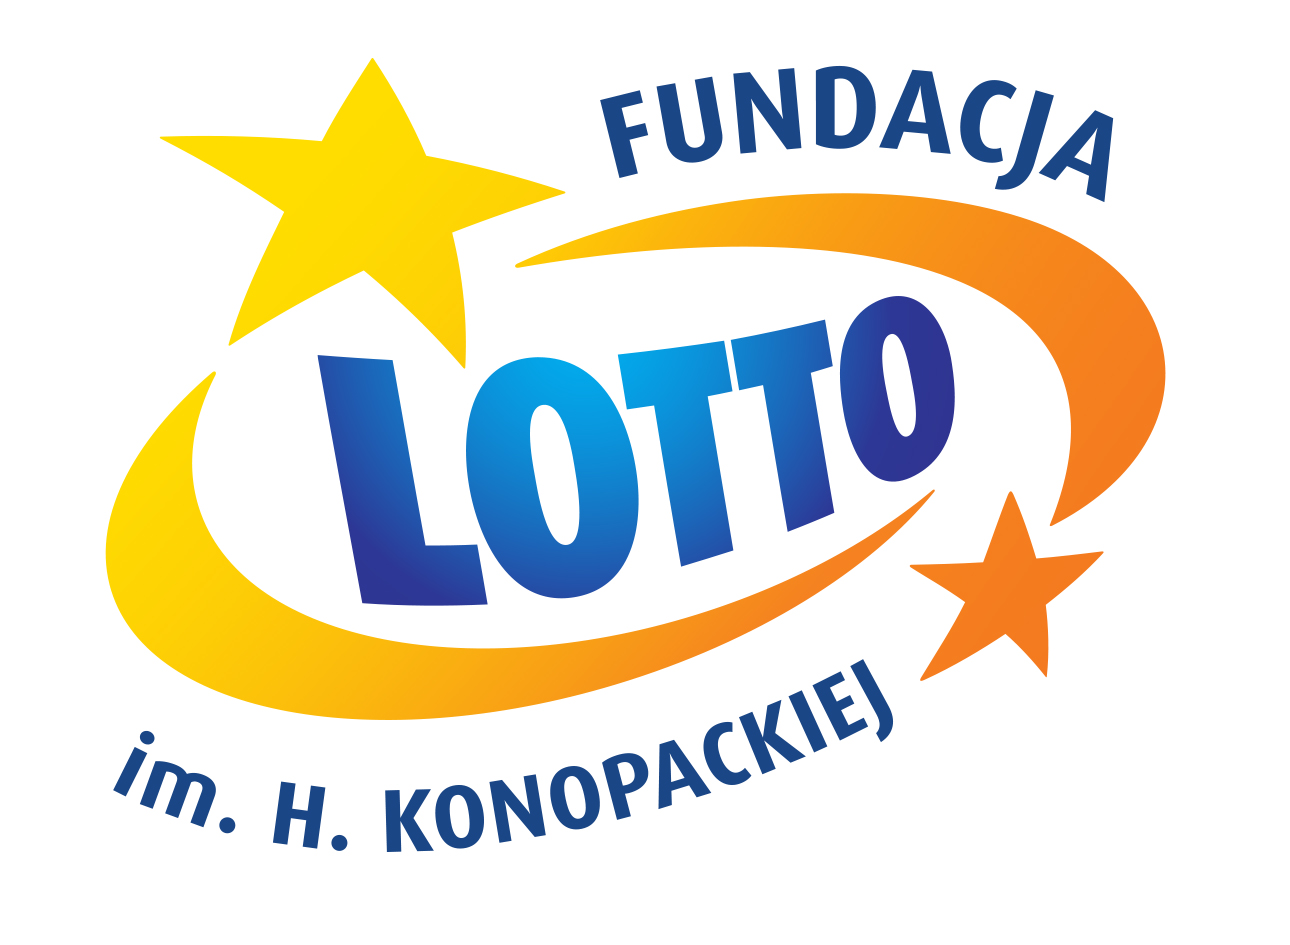 https://www.fundacjalotto.pl/wp-content/themes/fundacjalotto/assets/zdj/logo-fundacja/logo-fundacja-lotto-jpg.jpg